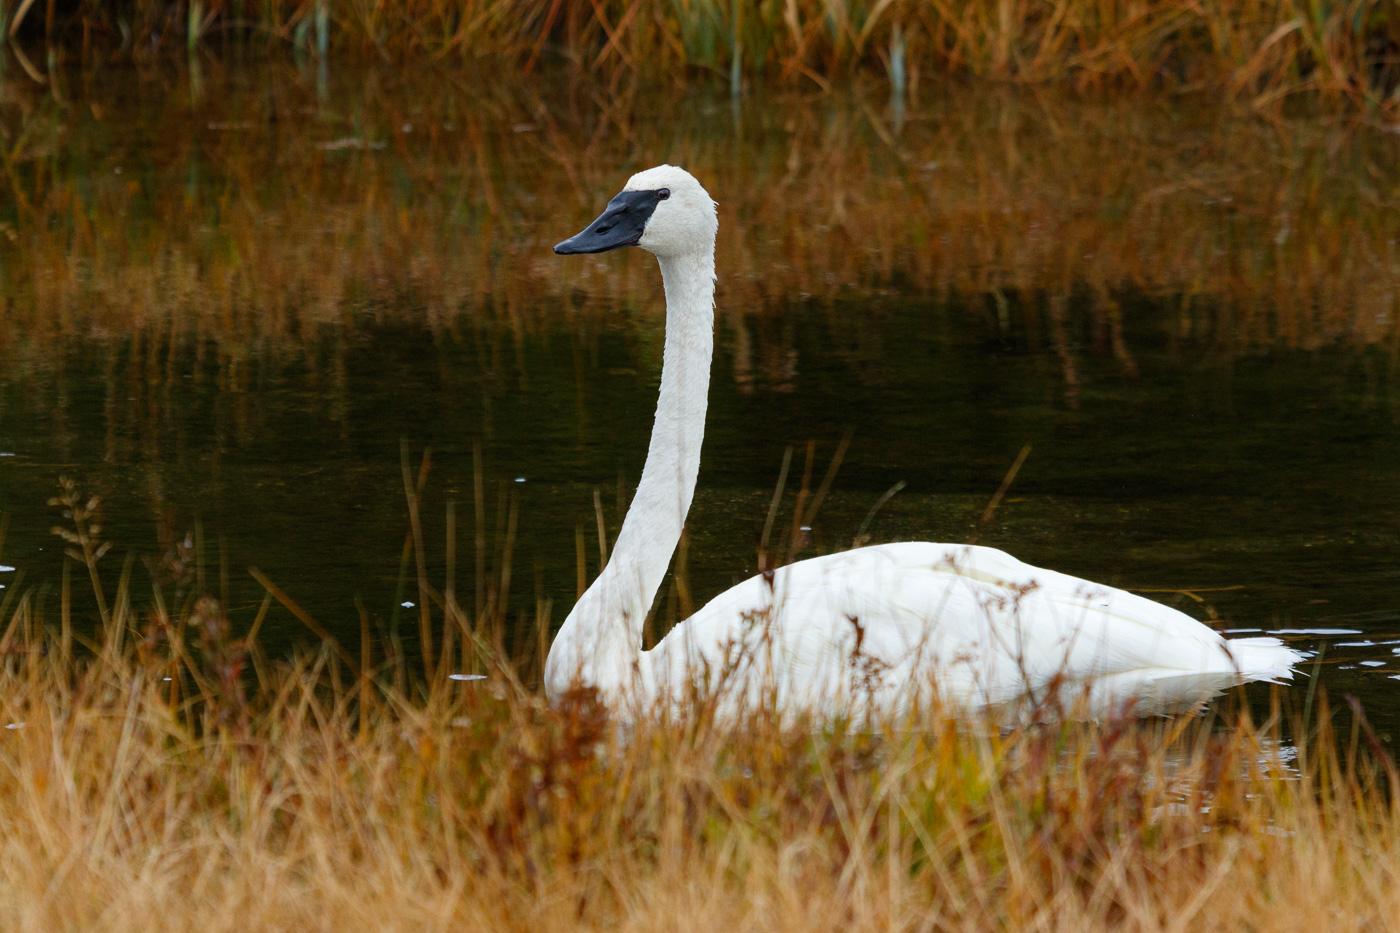 Trumpeter swan (Cygnus buccinator), Yellowstone National Park, U.S.A. - Fauna de Nord-Amèrica - Raül Carmona - Fotografia, Fotografia d'estudi, esdeveniments i Natura